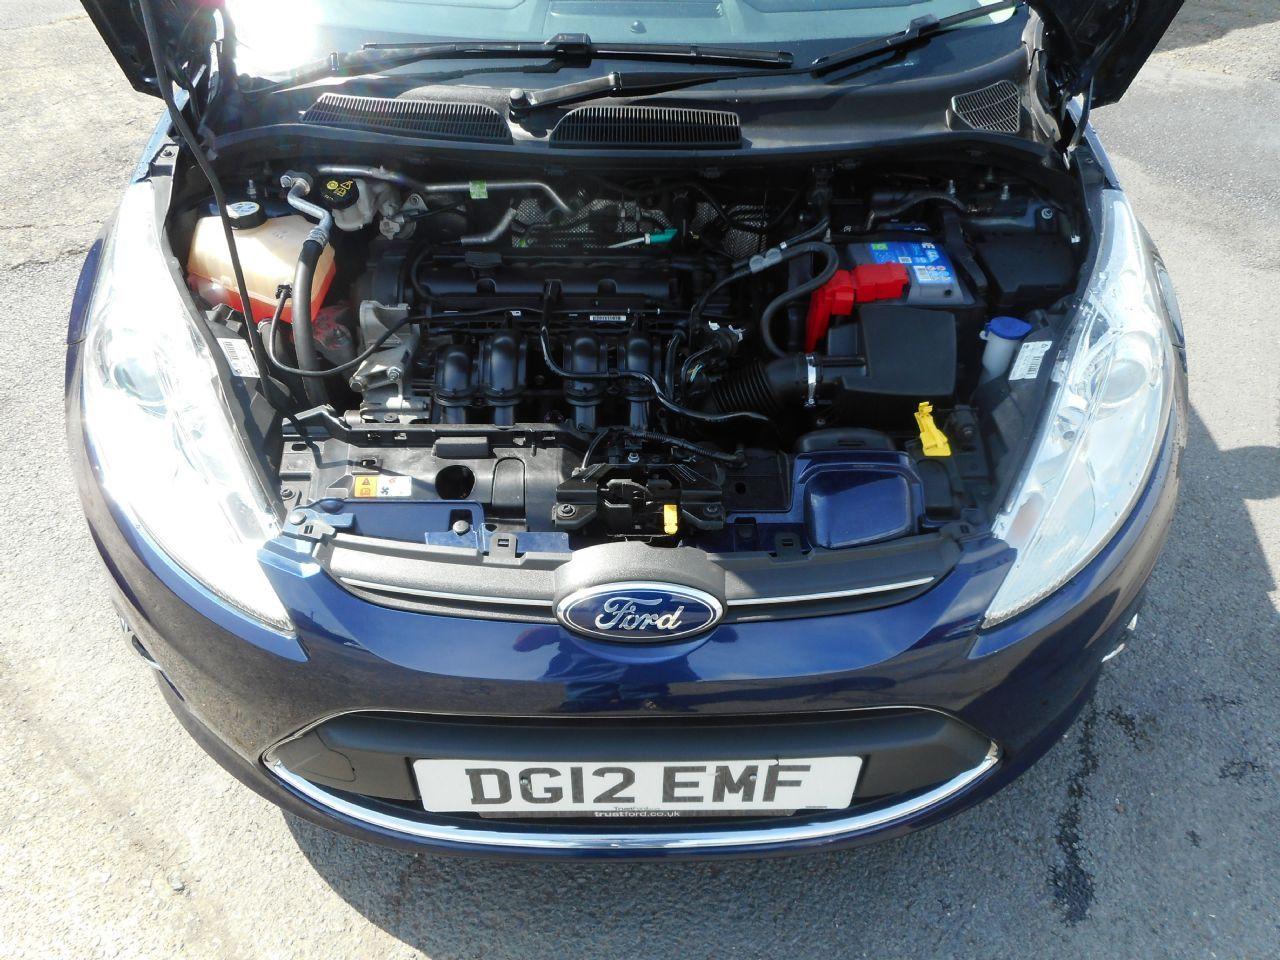 FORD Fiesta Titanium 1.4 096 Auto (2012) - Picture 17